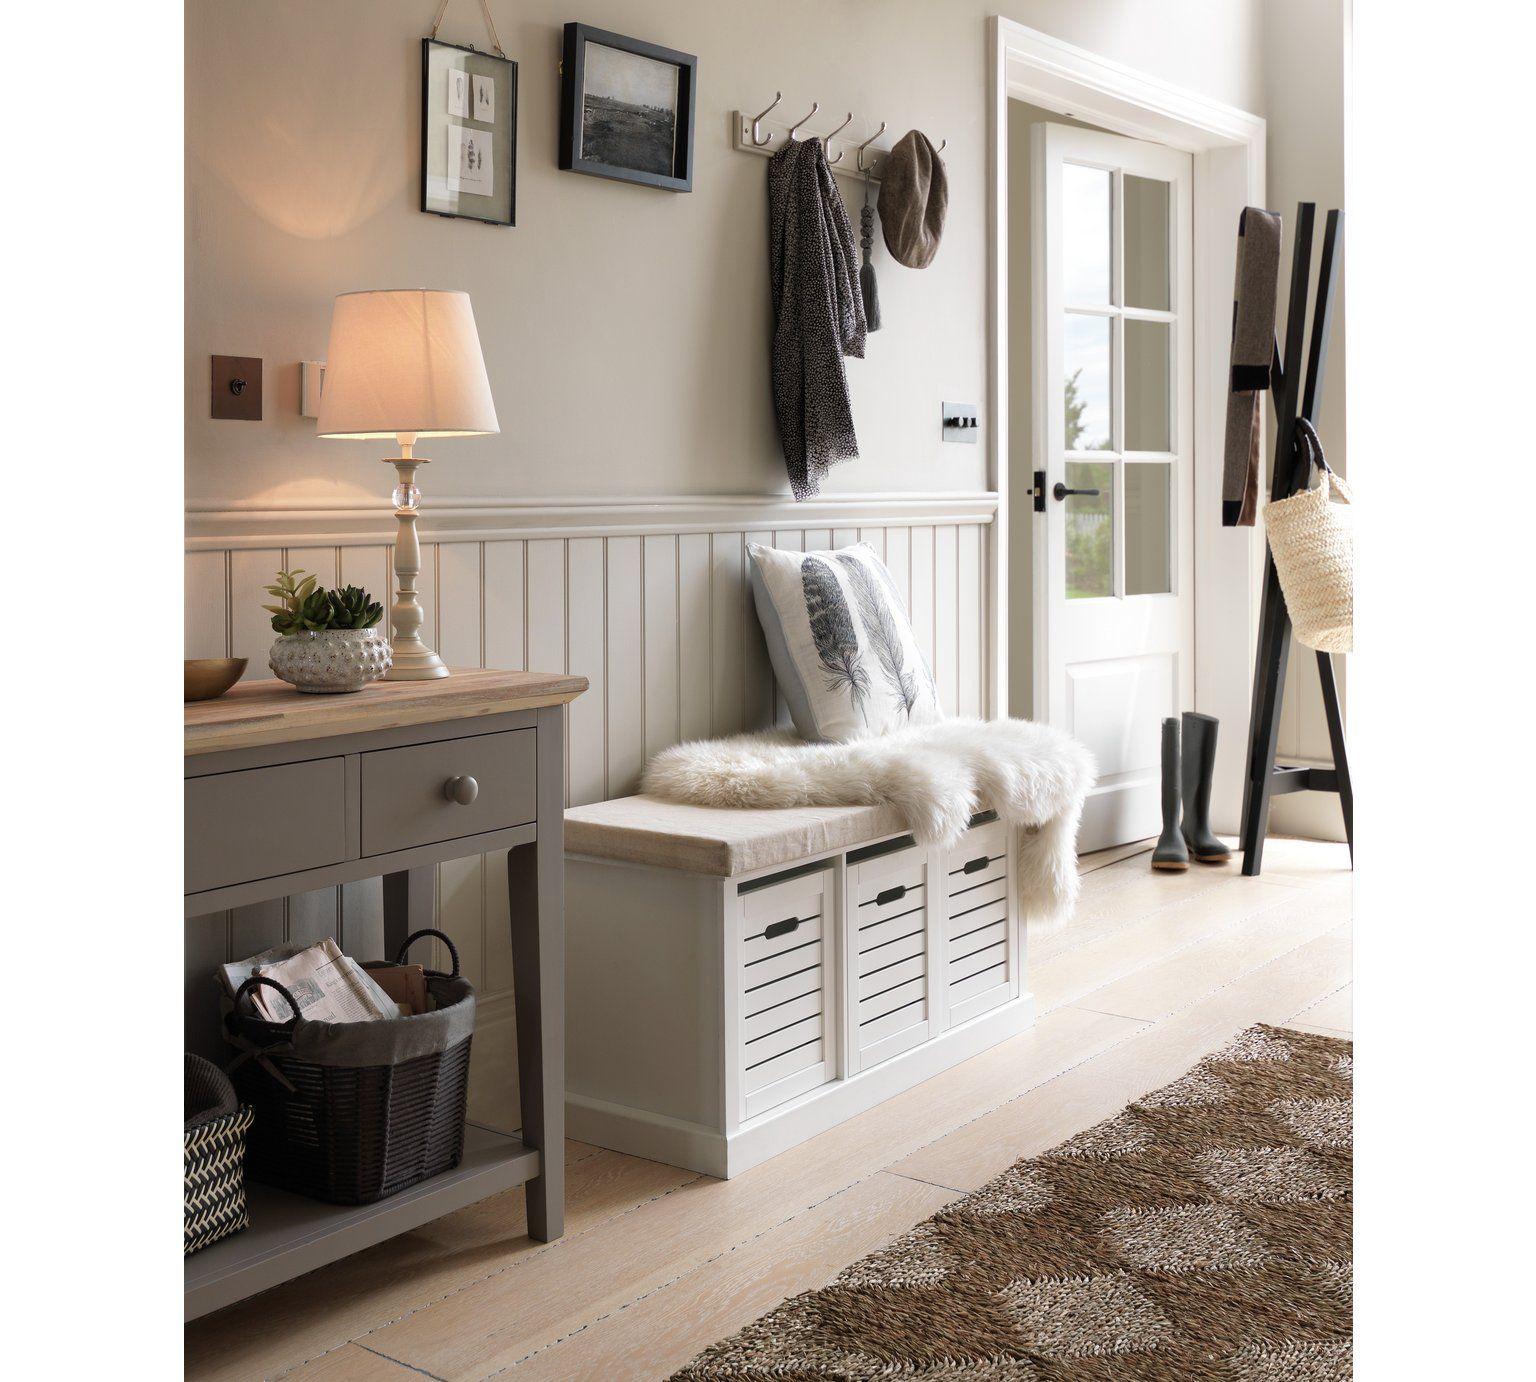 Buy Home Hereford Storage Bench White At Argos Co Uk Visit Argos Co Uk To Shop Online For Hallway Storage Hallway Furnitur Idei Interera Interer Prihozhaya